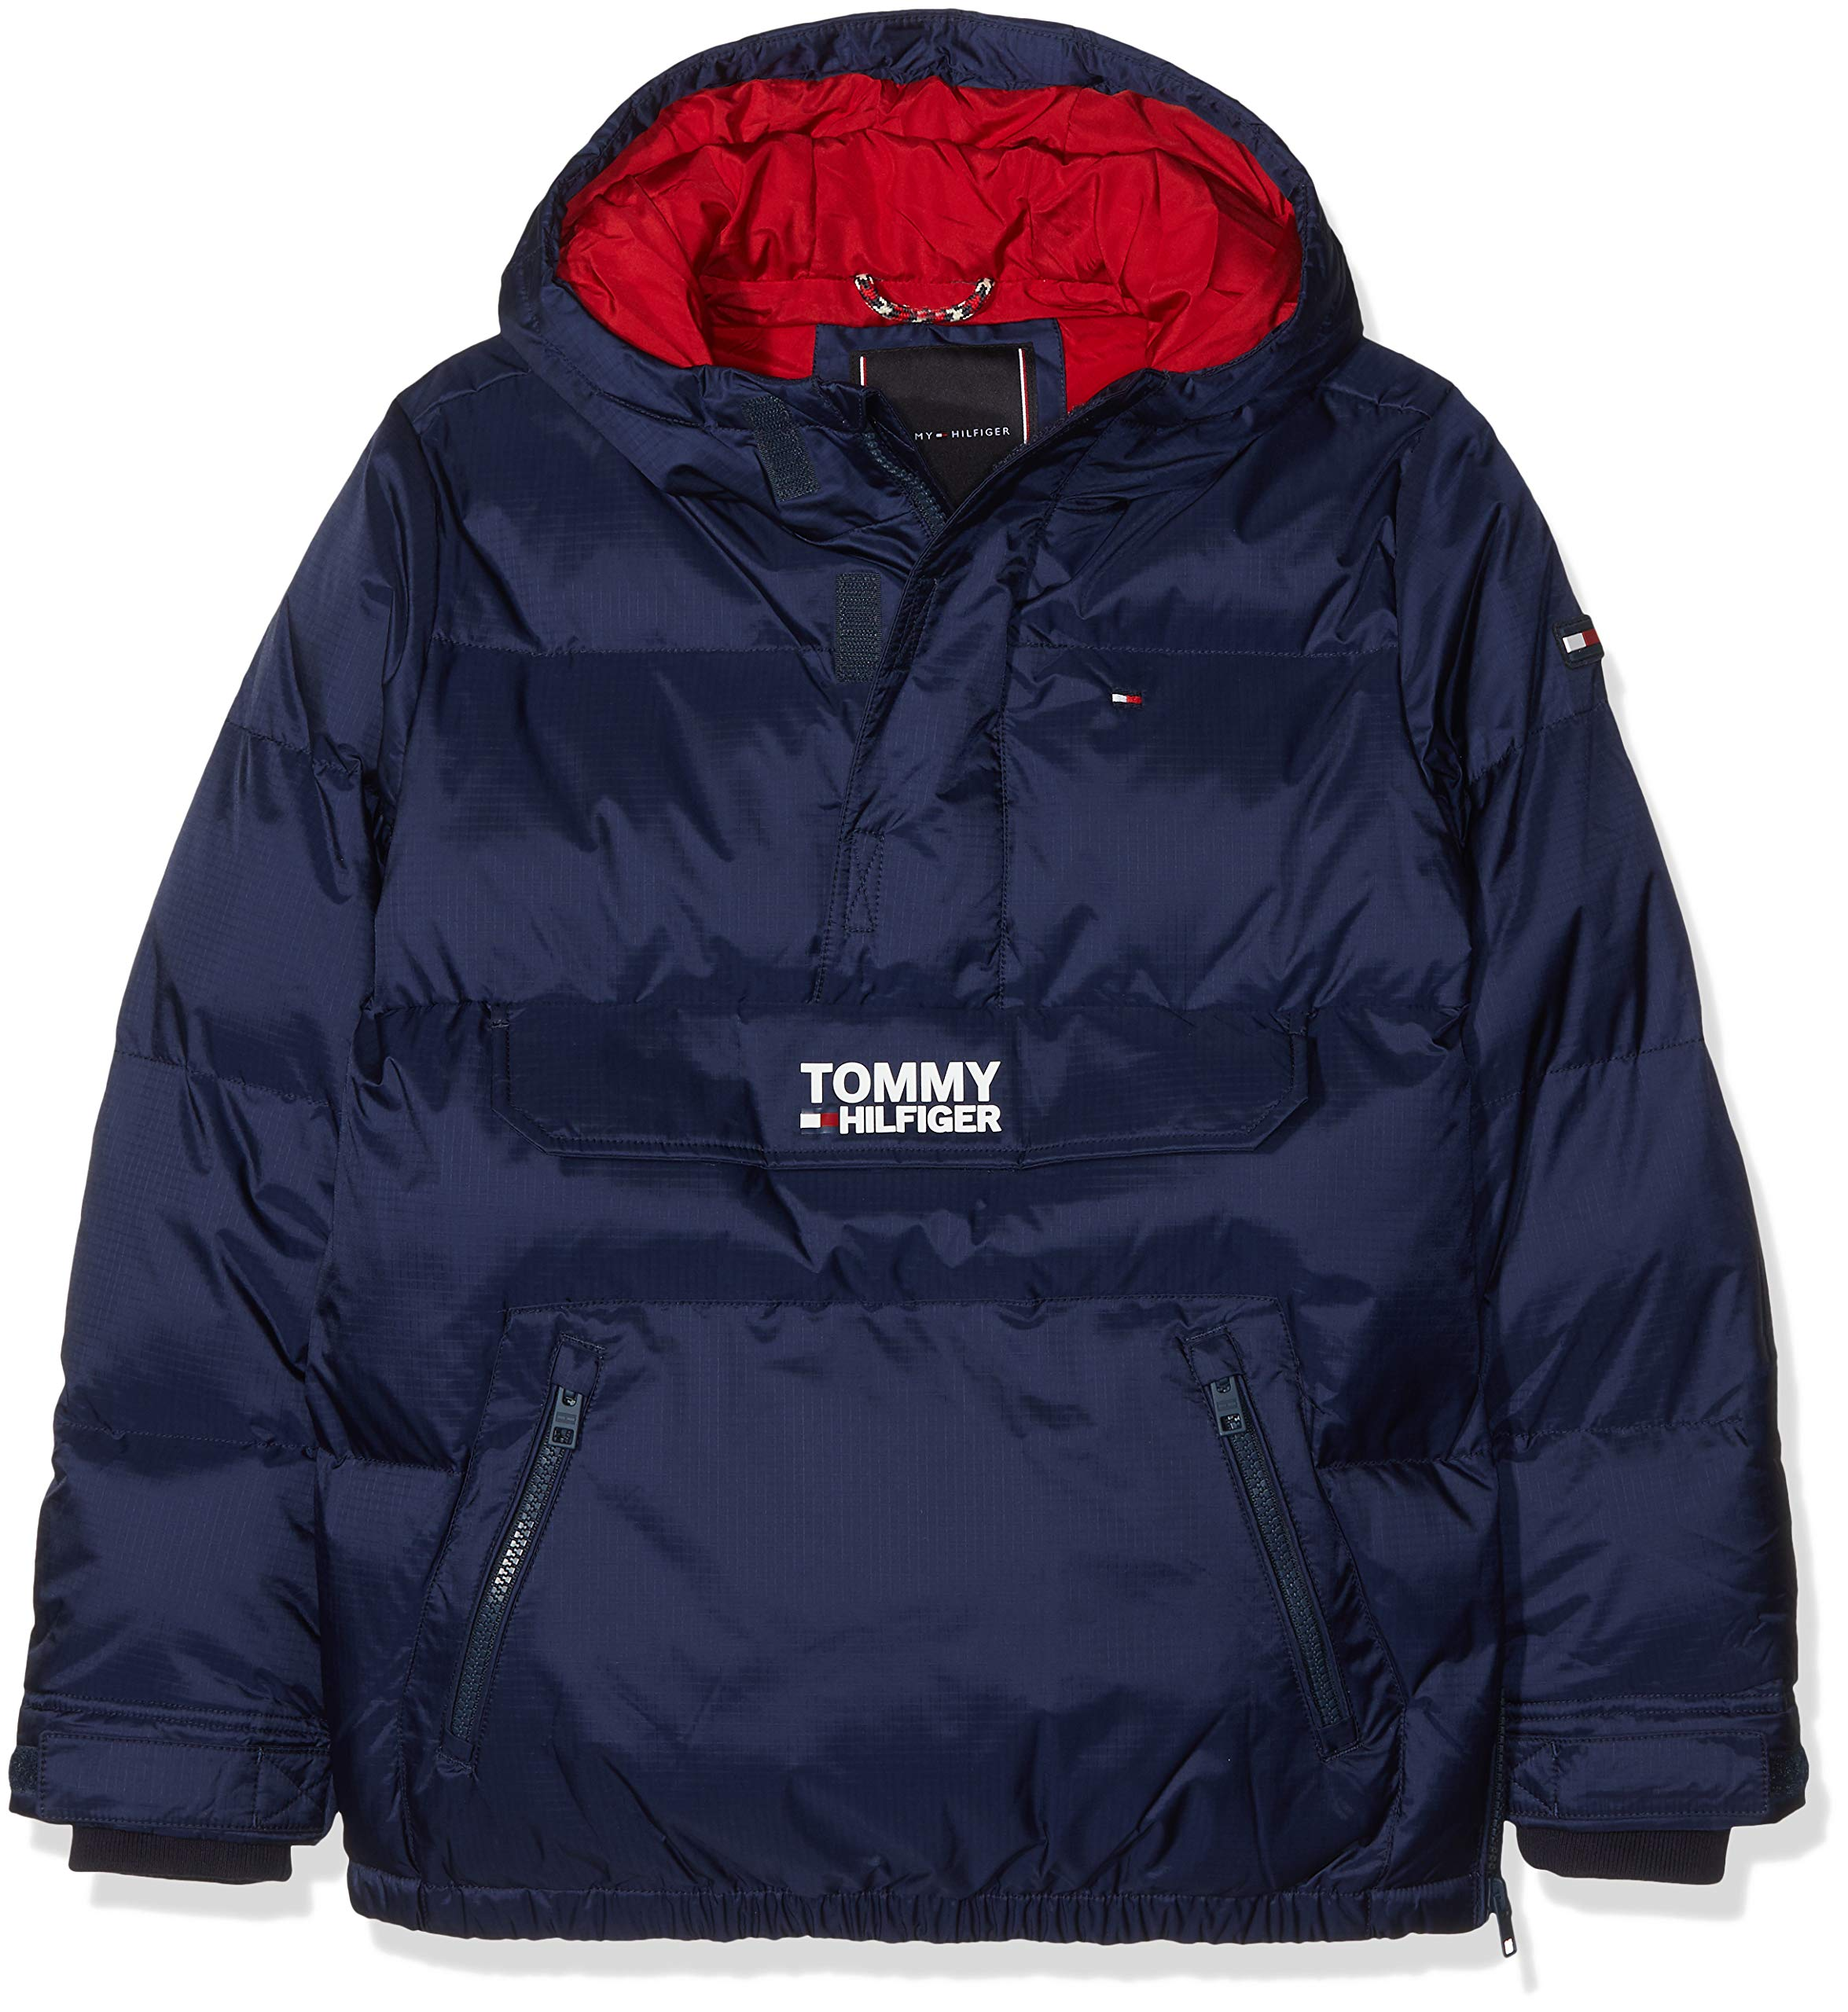 Tommy Hilfiger Padded Pop Over Jacket Chaqueta para Niños